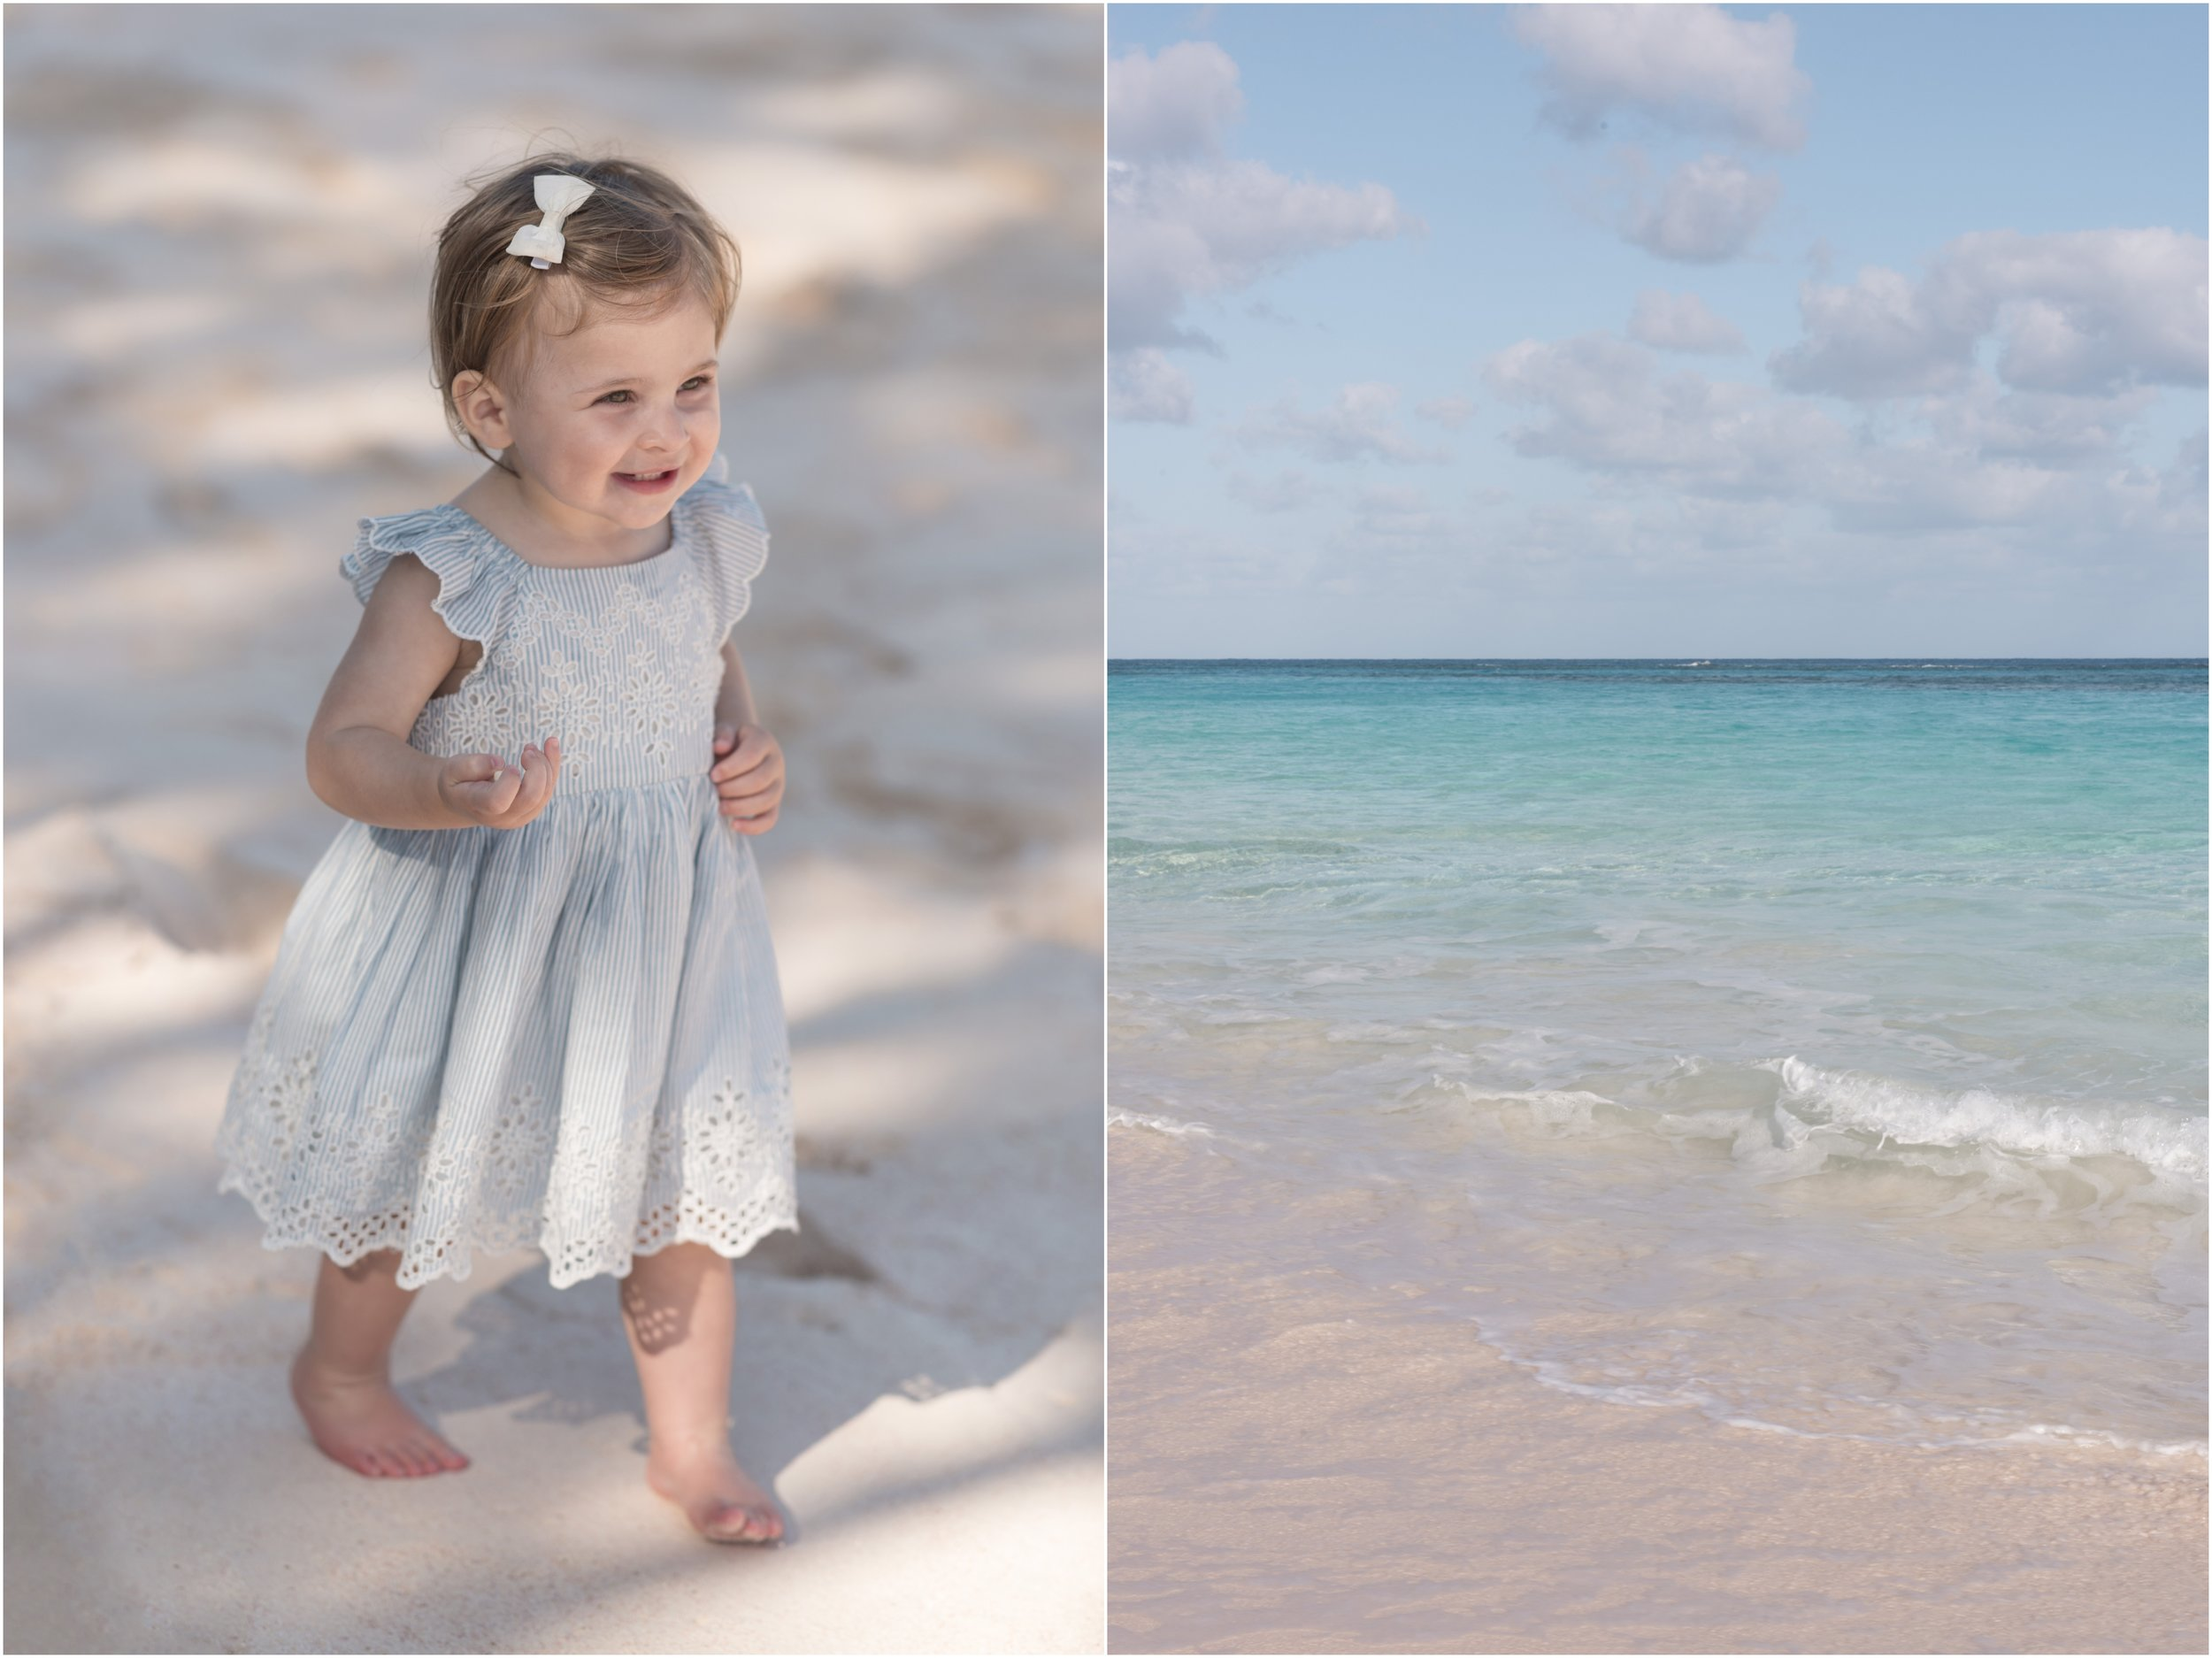 ©FianderFoto_Gruska_Tuckers Point Bermuda_8.jpg